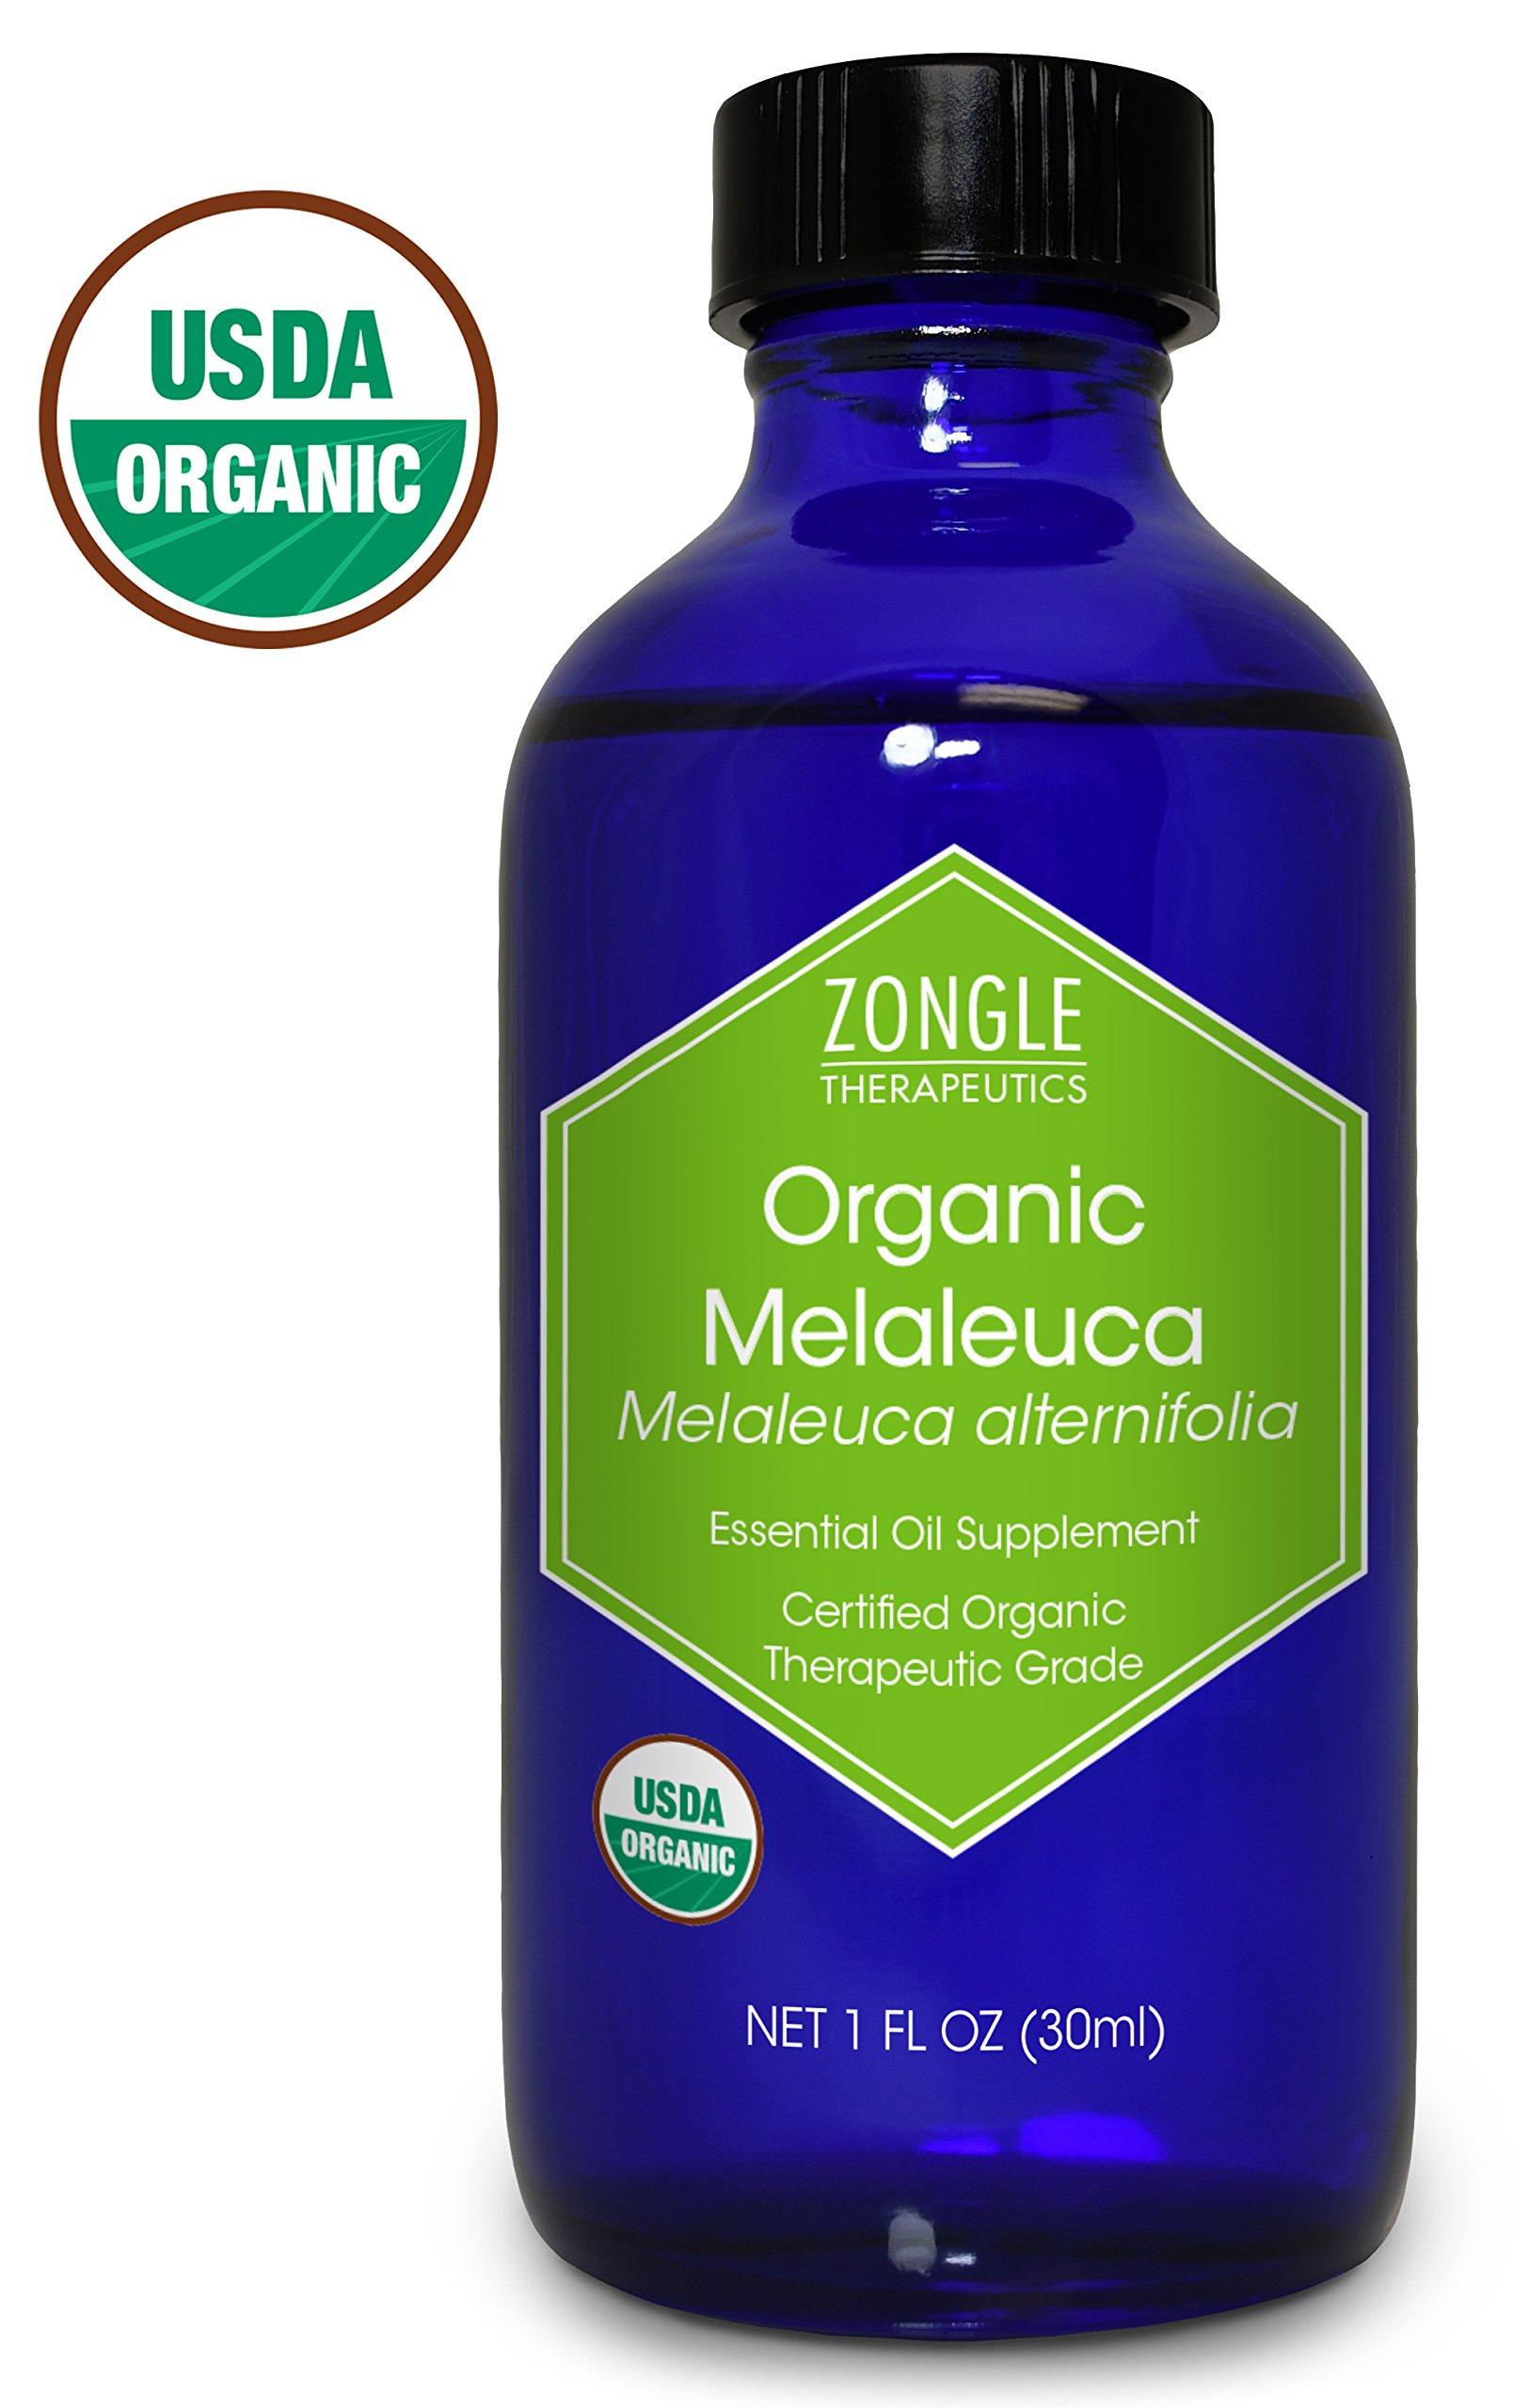 Zongle USDA Certified Organic Melaleuca (Tea Tree) Essential Oil, Australian, Safe to Ingest, Melaleuca Alternifolia, 1 oz